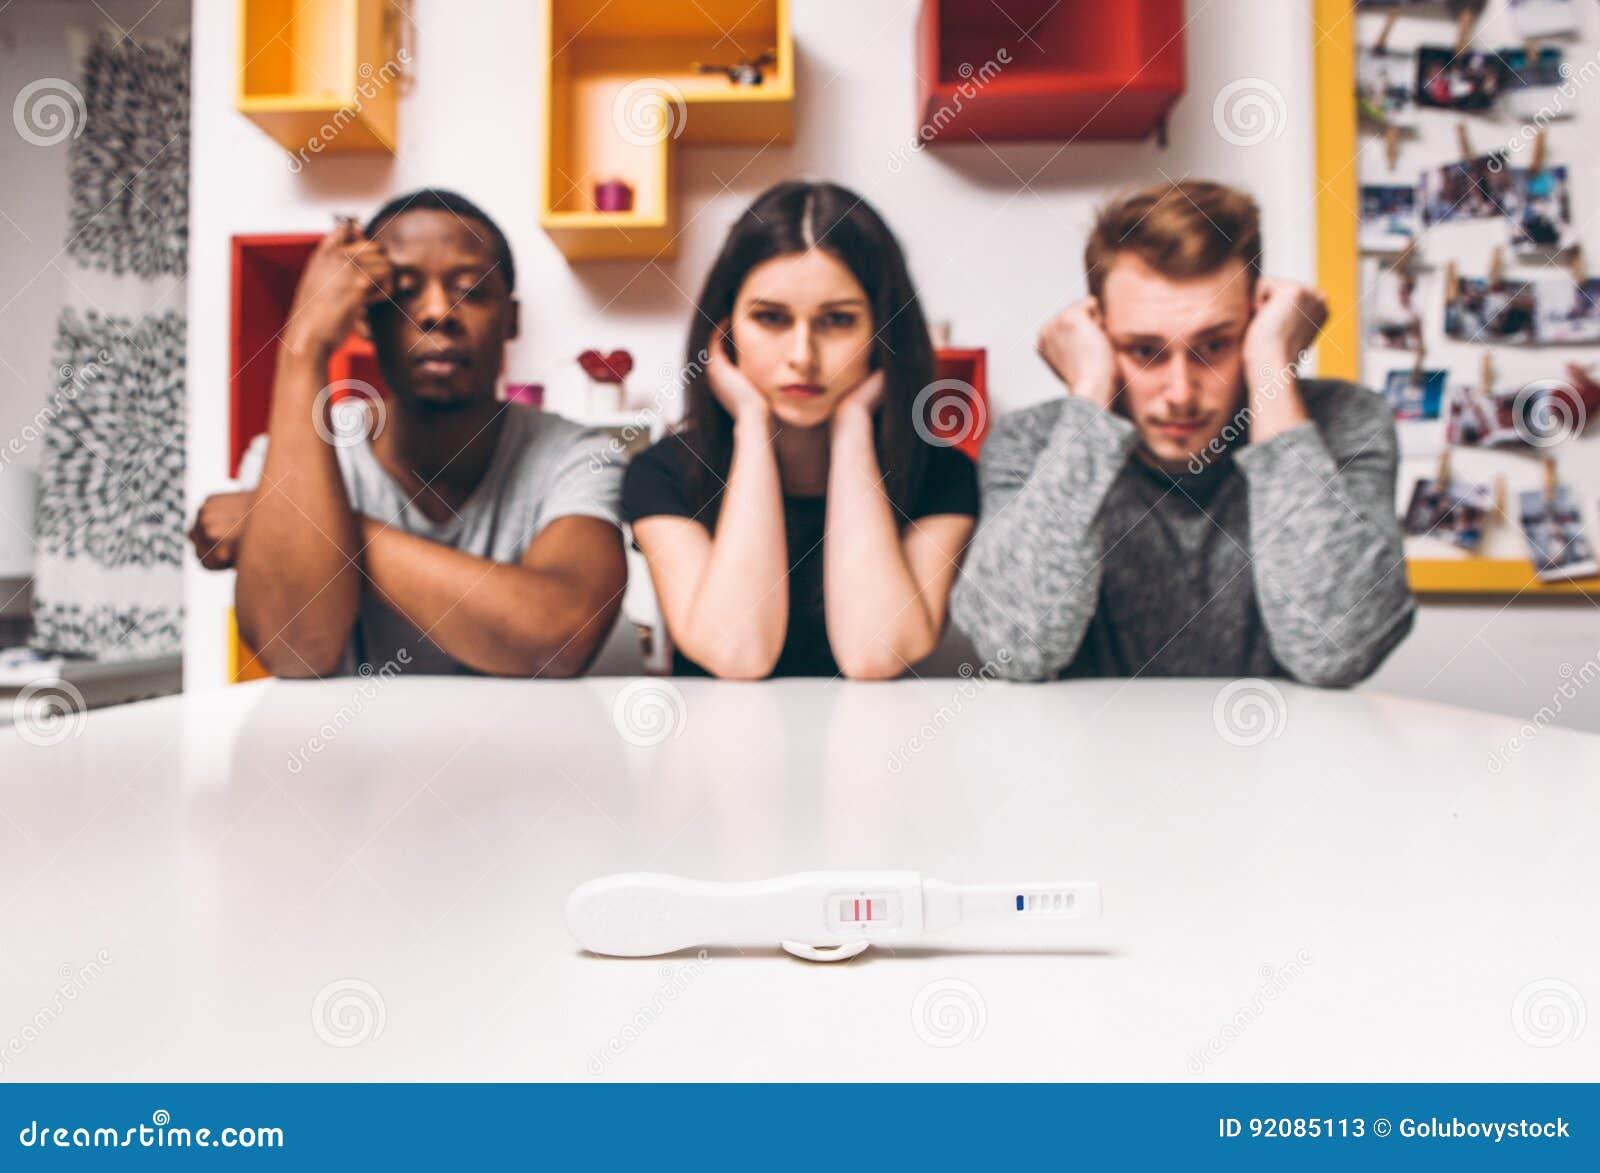 Teste de gravidez positivo, três povos, poligamia